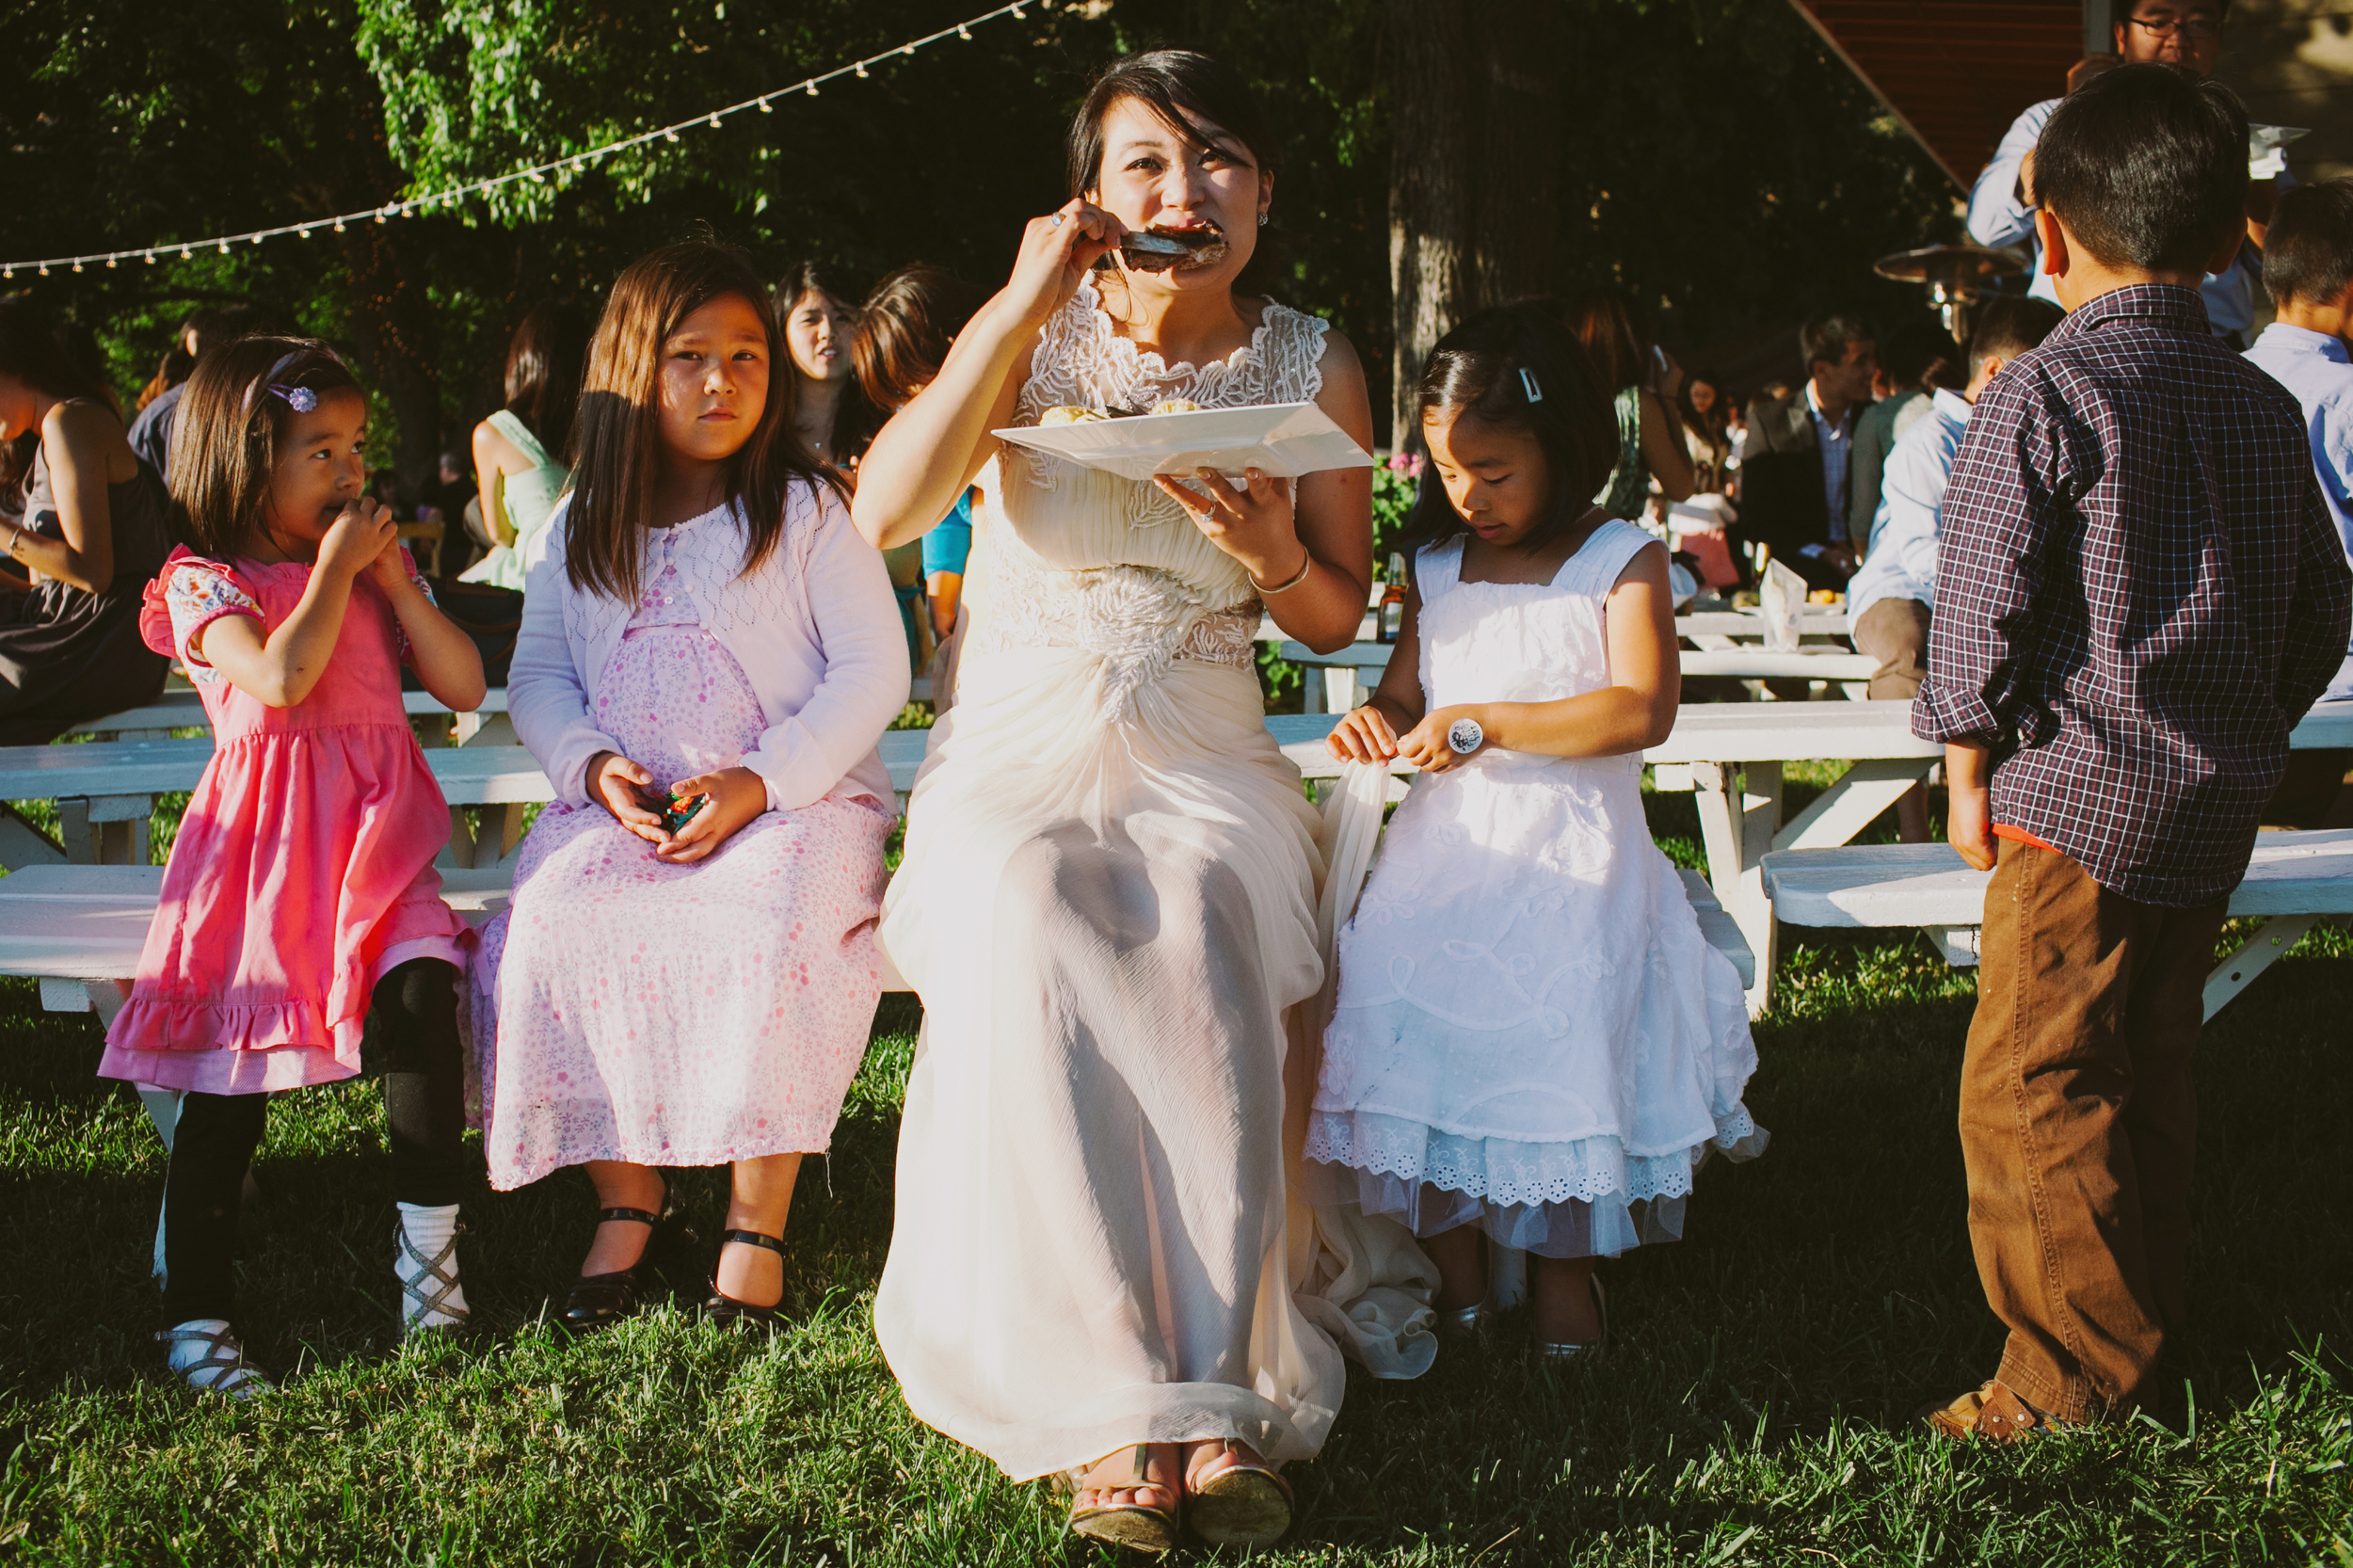 Diablo_Ranch_Wedding_Photography_Becky_Will-30.JPG